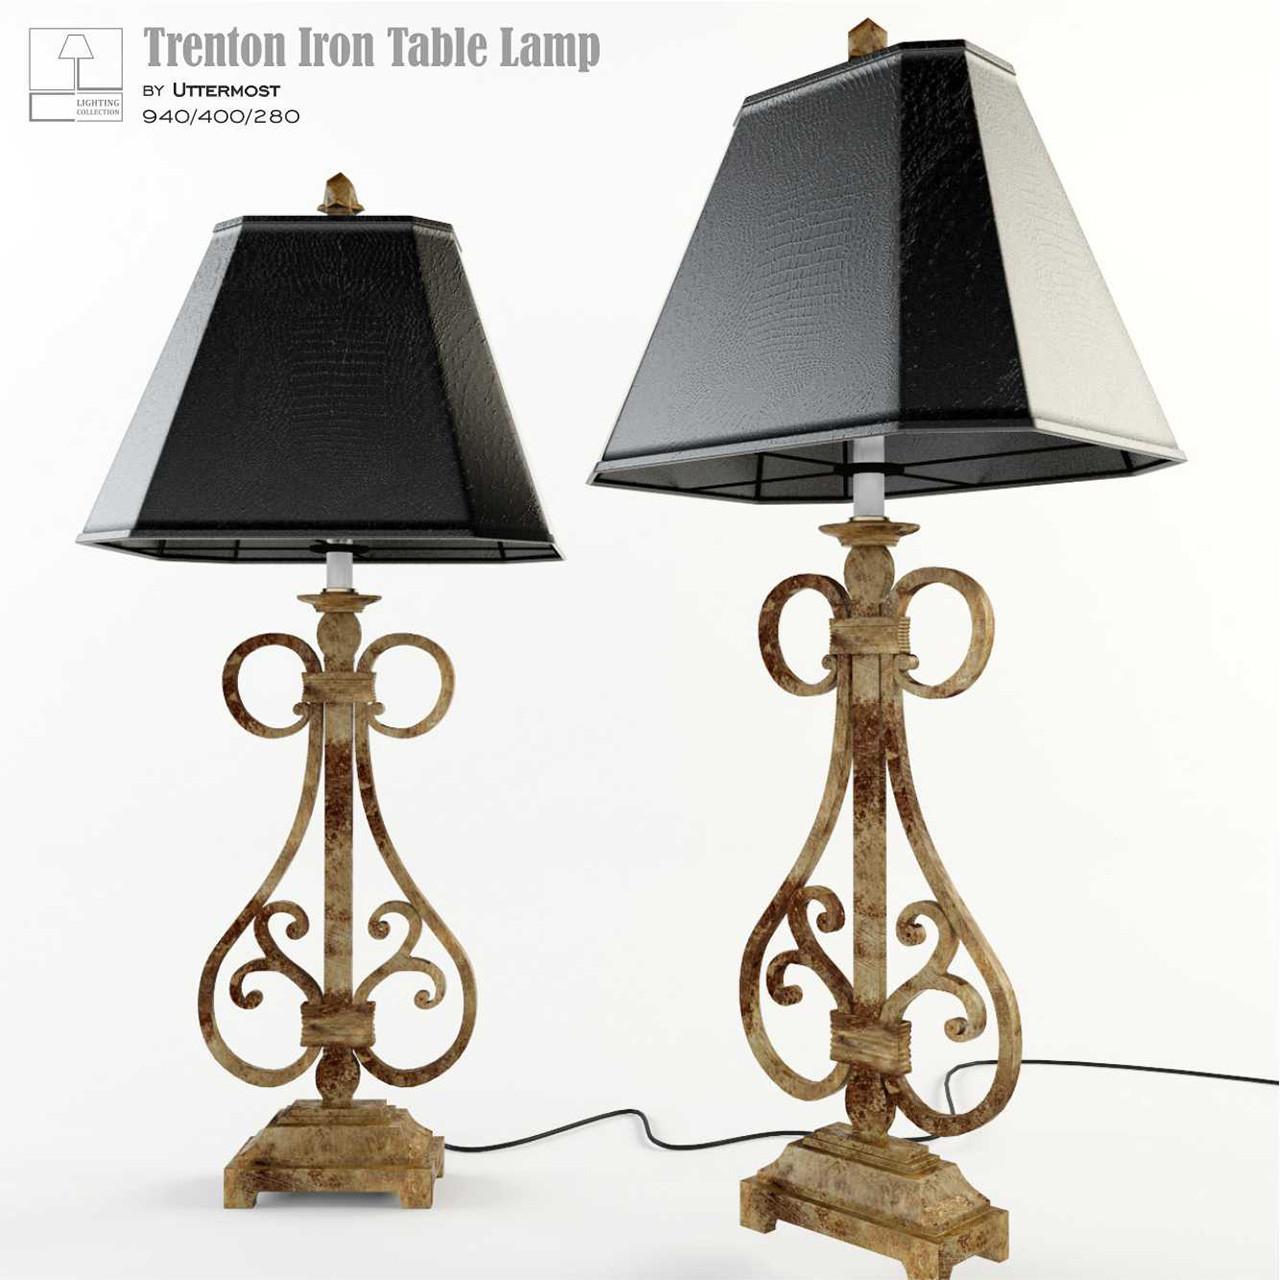 Trenton Iron Table Lamp